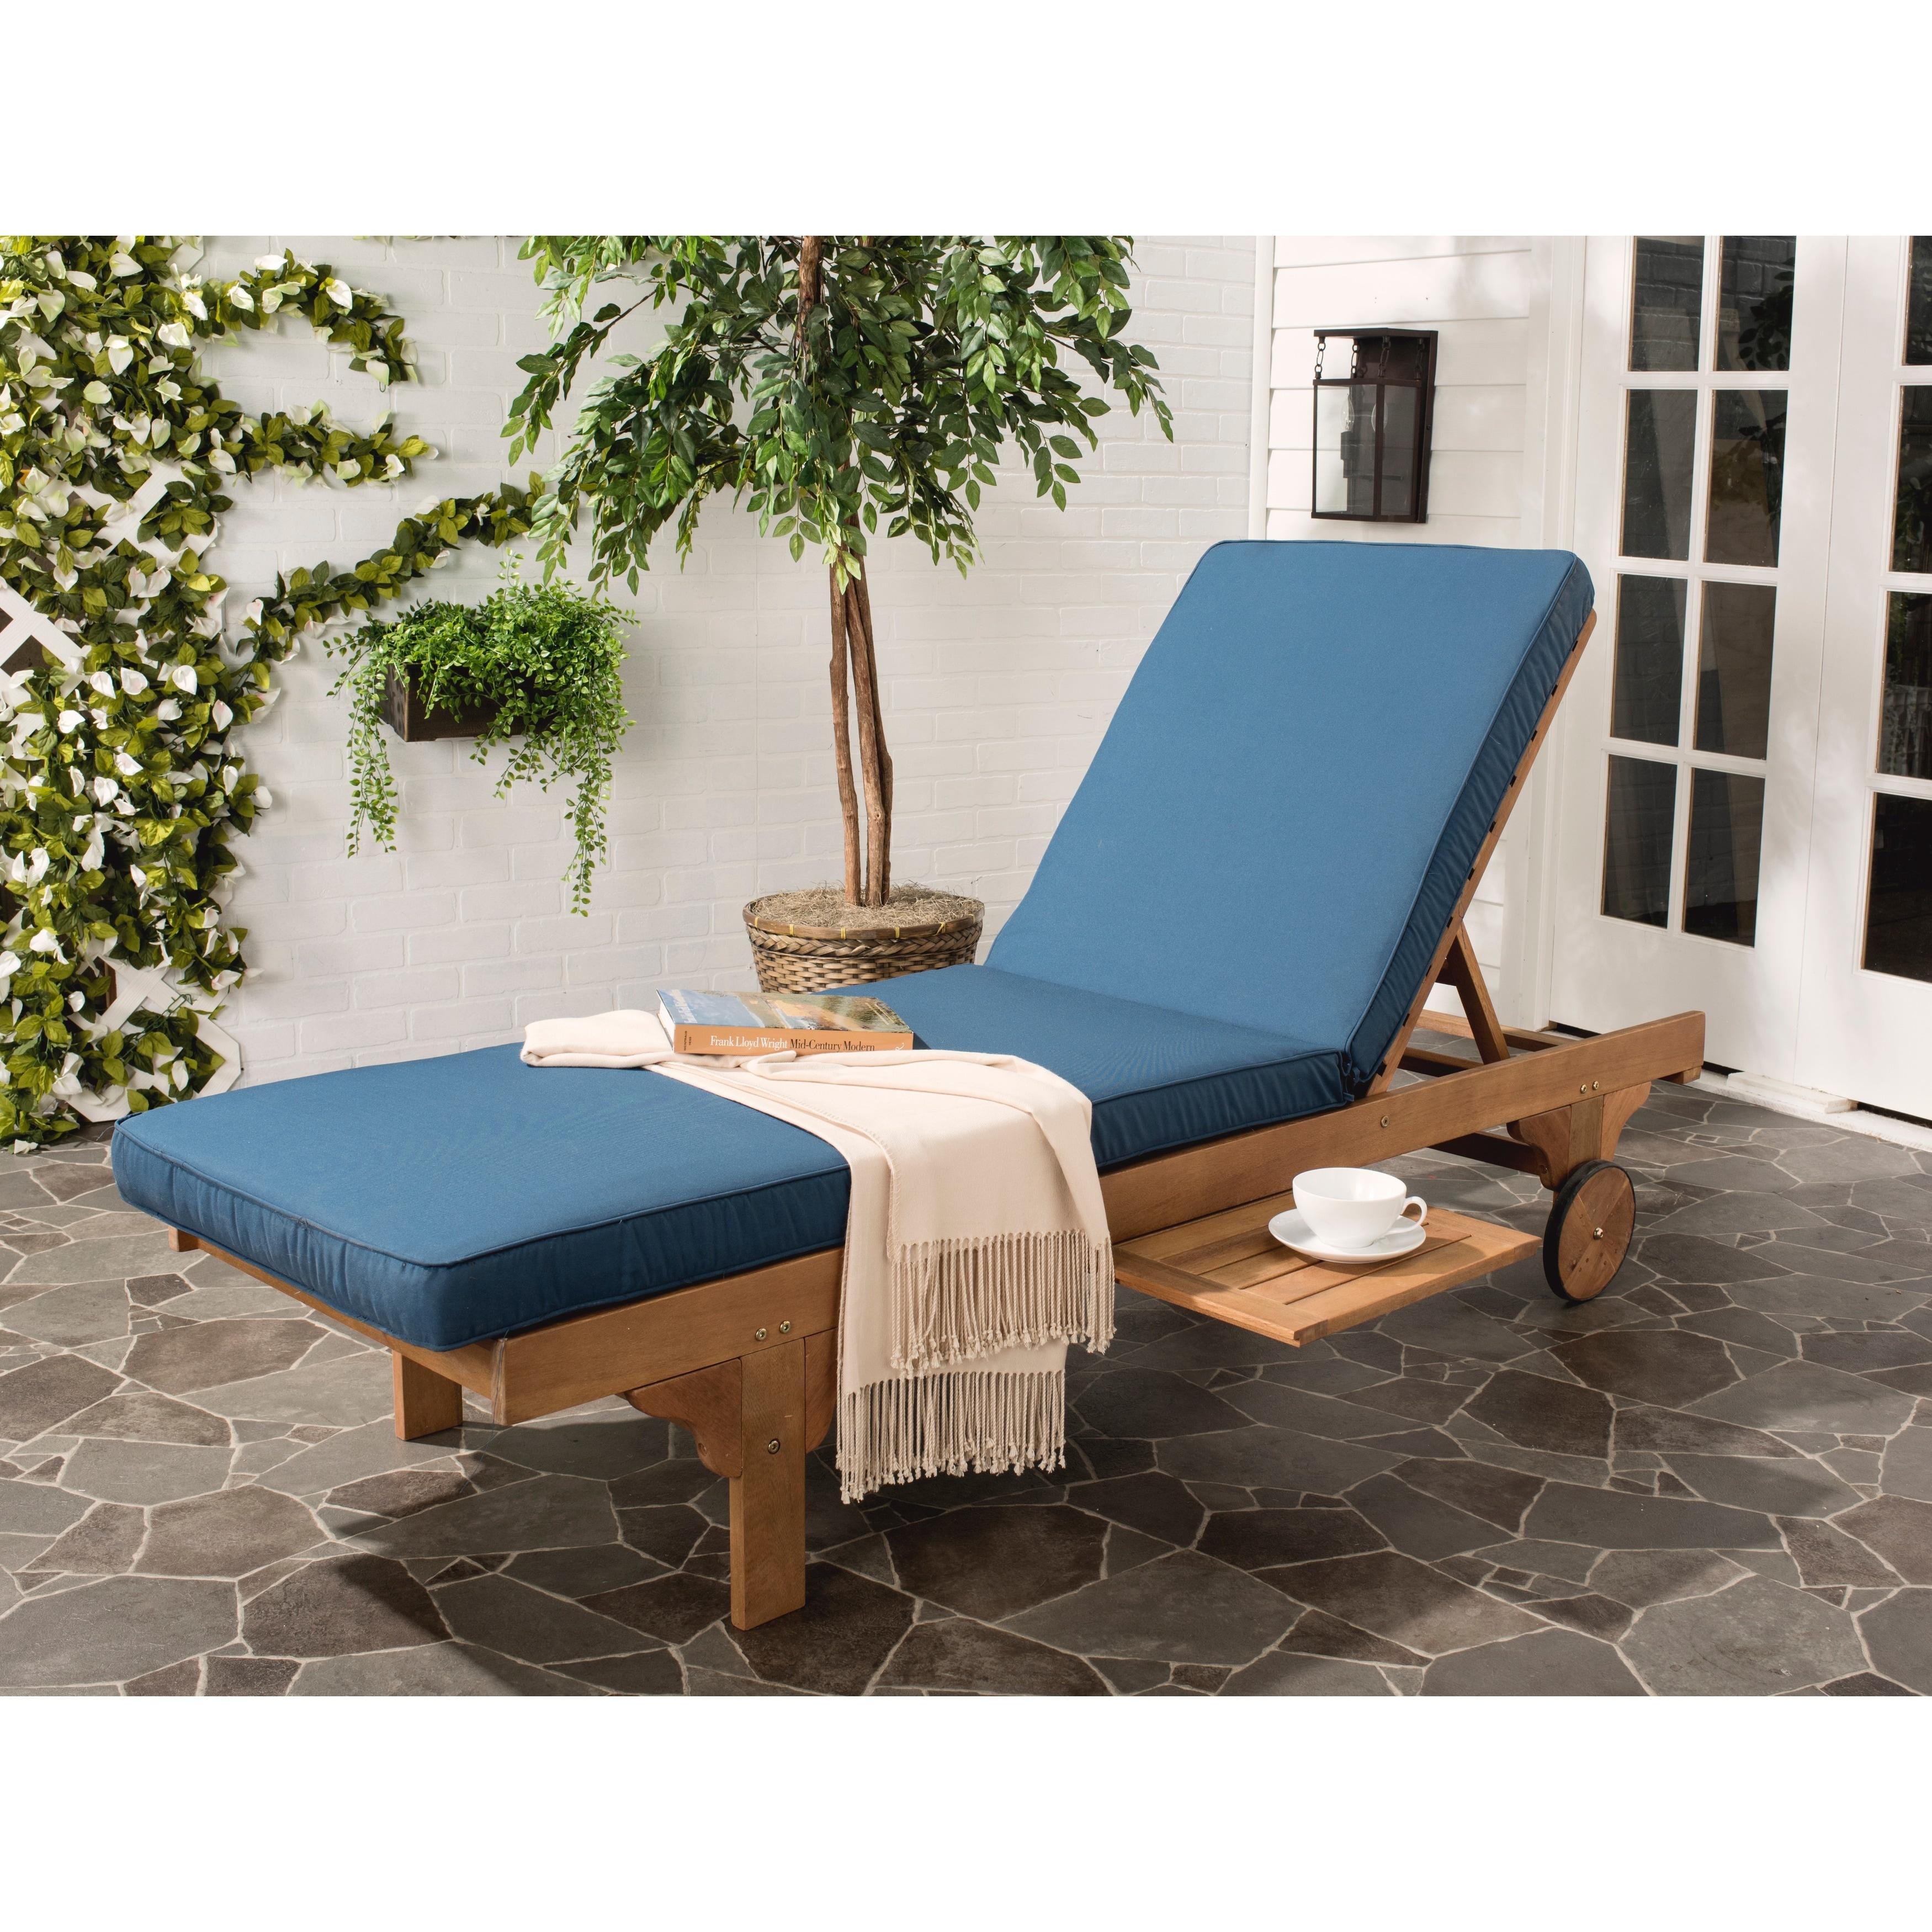 shop safavieh outdoor living newport brown navy adjustable chaise